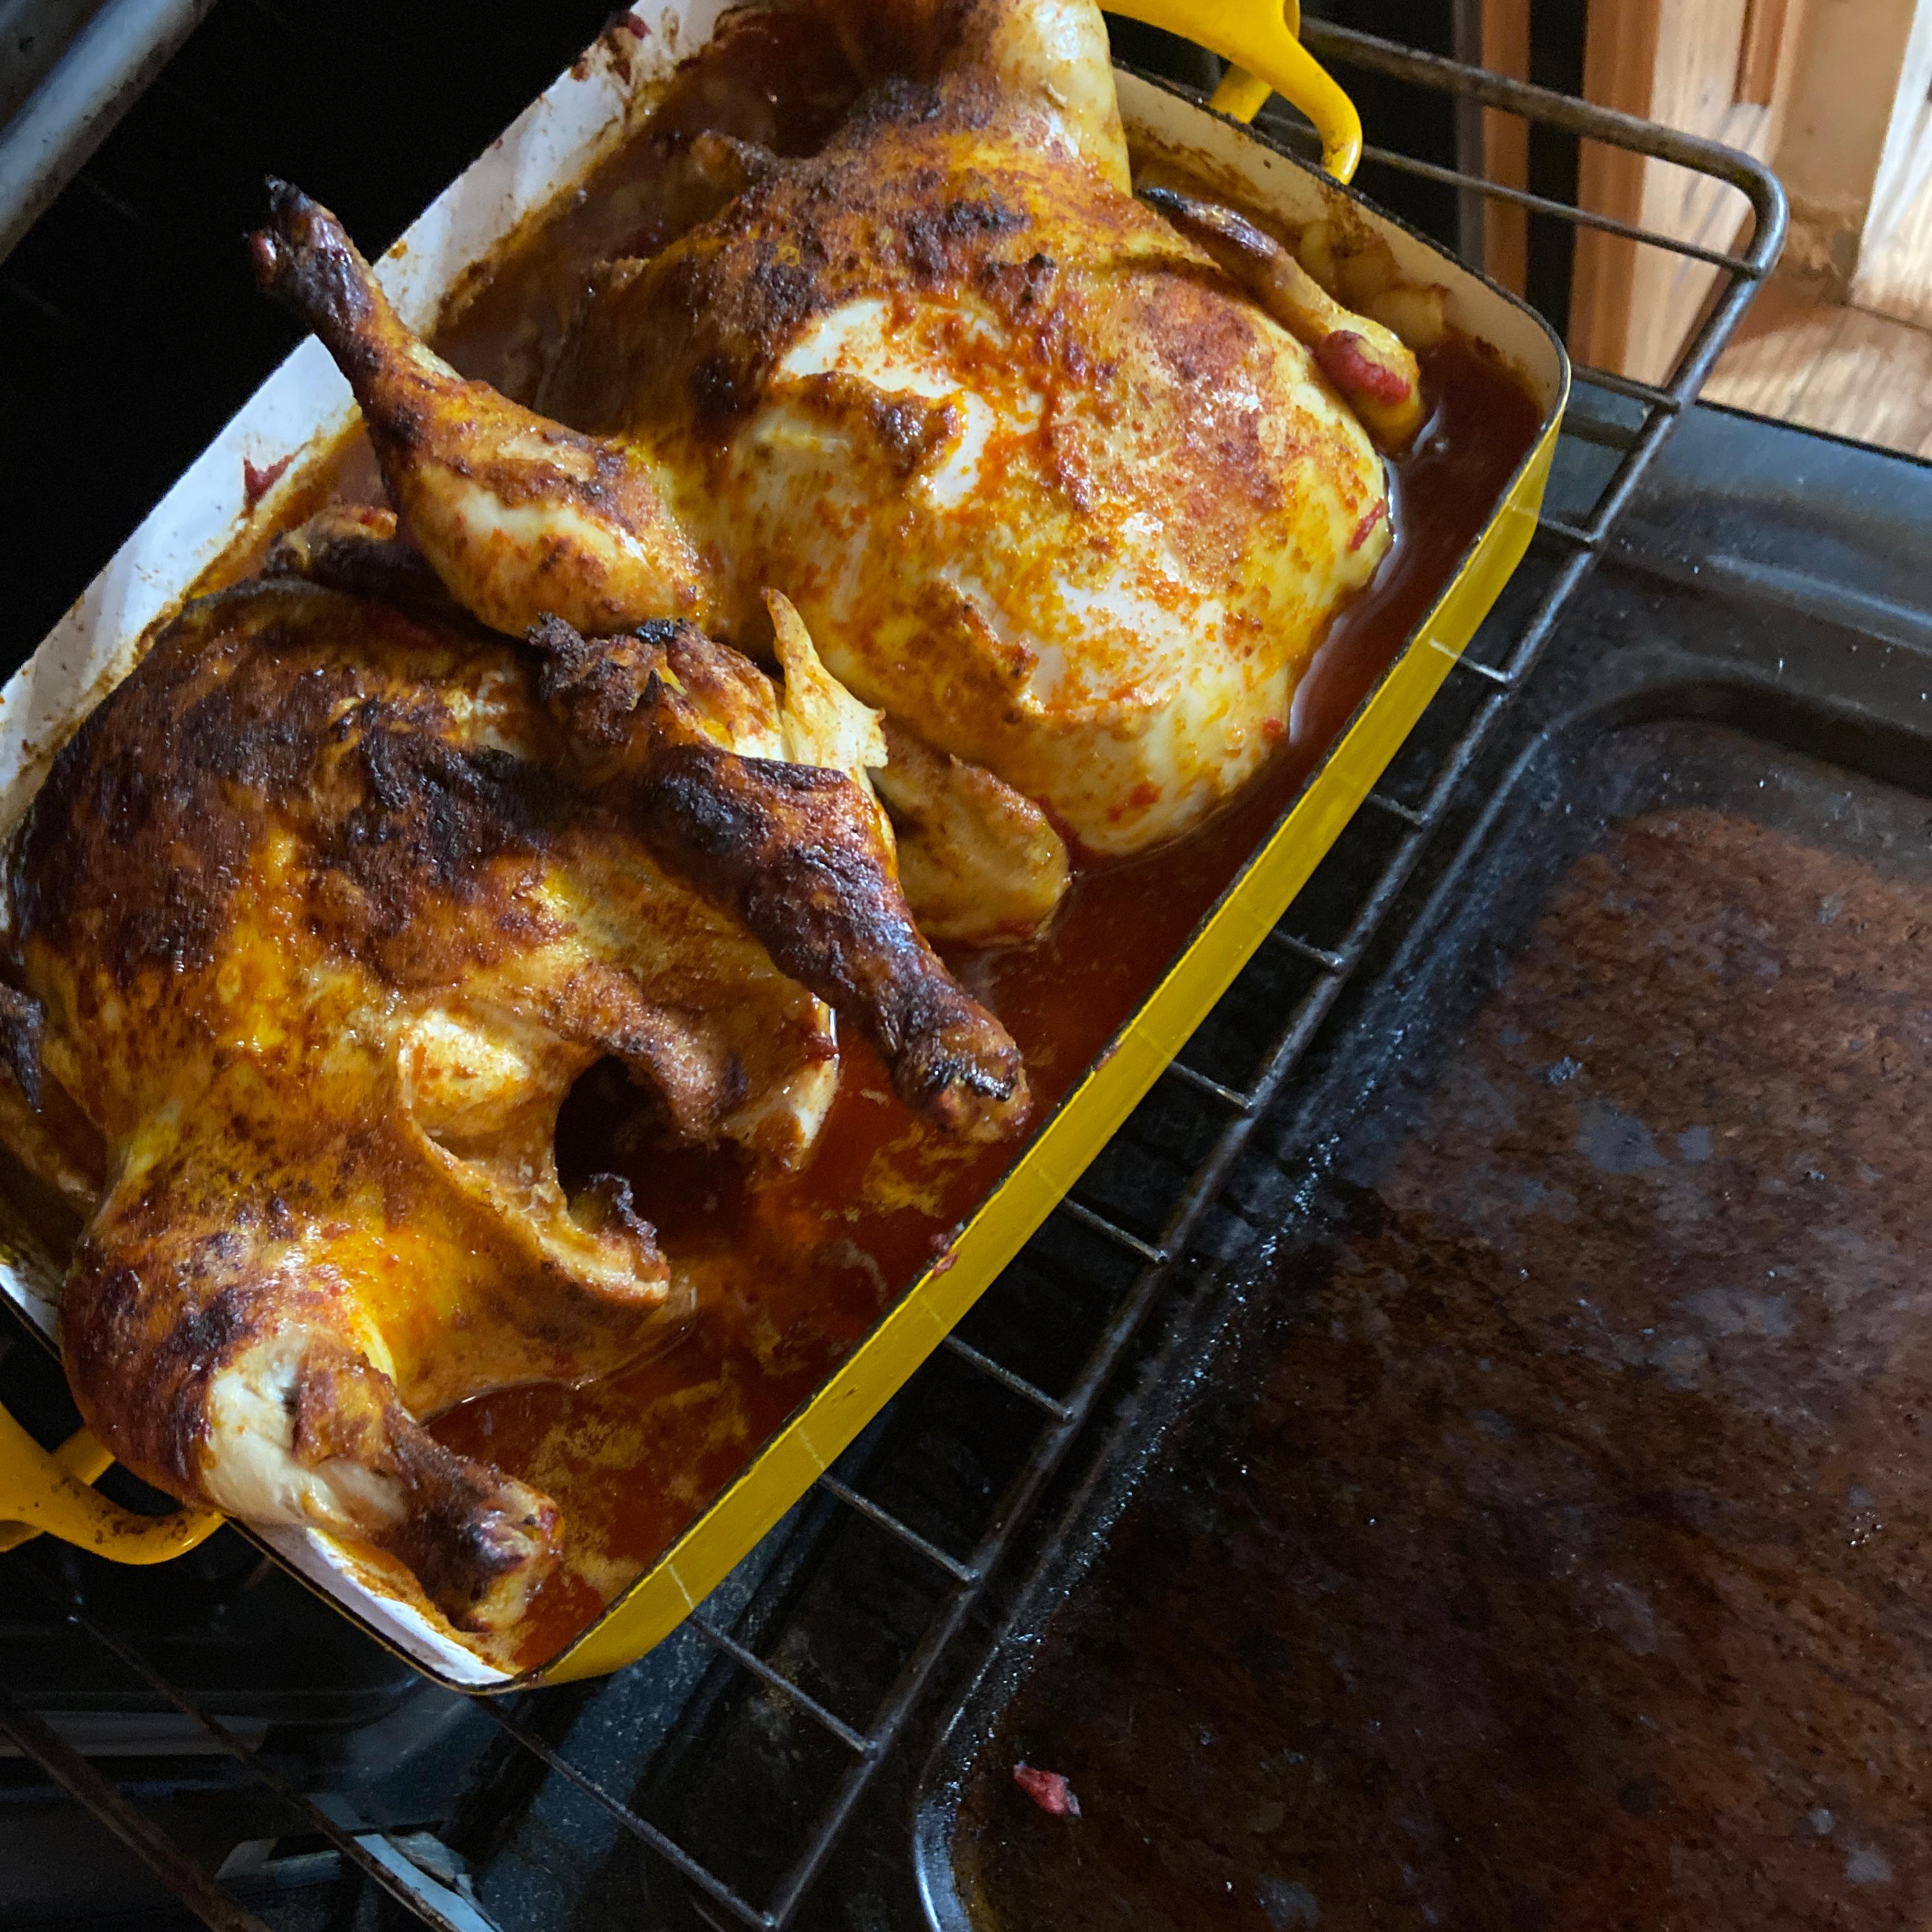 Pontevedra-Style Spanish Chicken Katy Mckee-Richmond